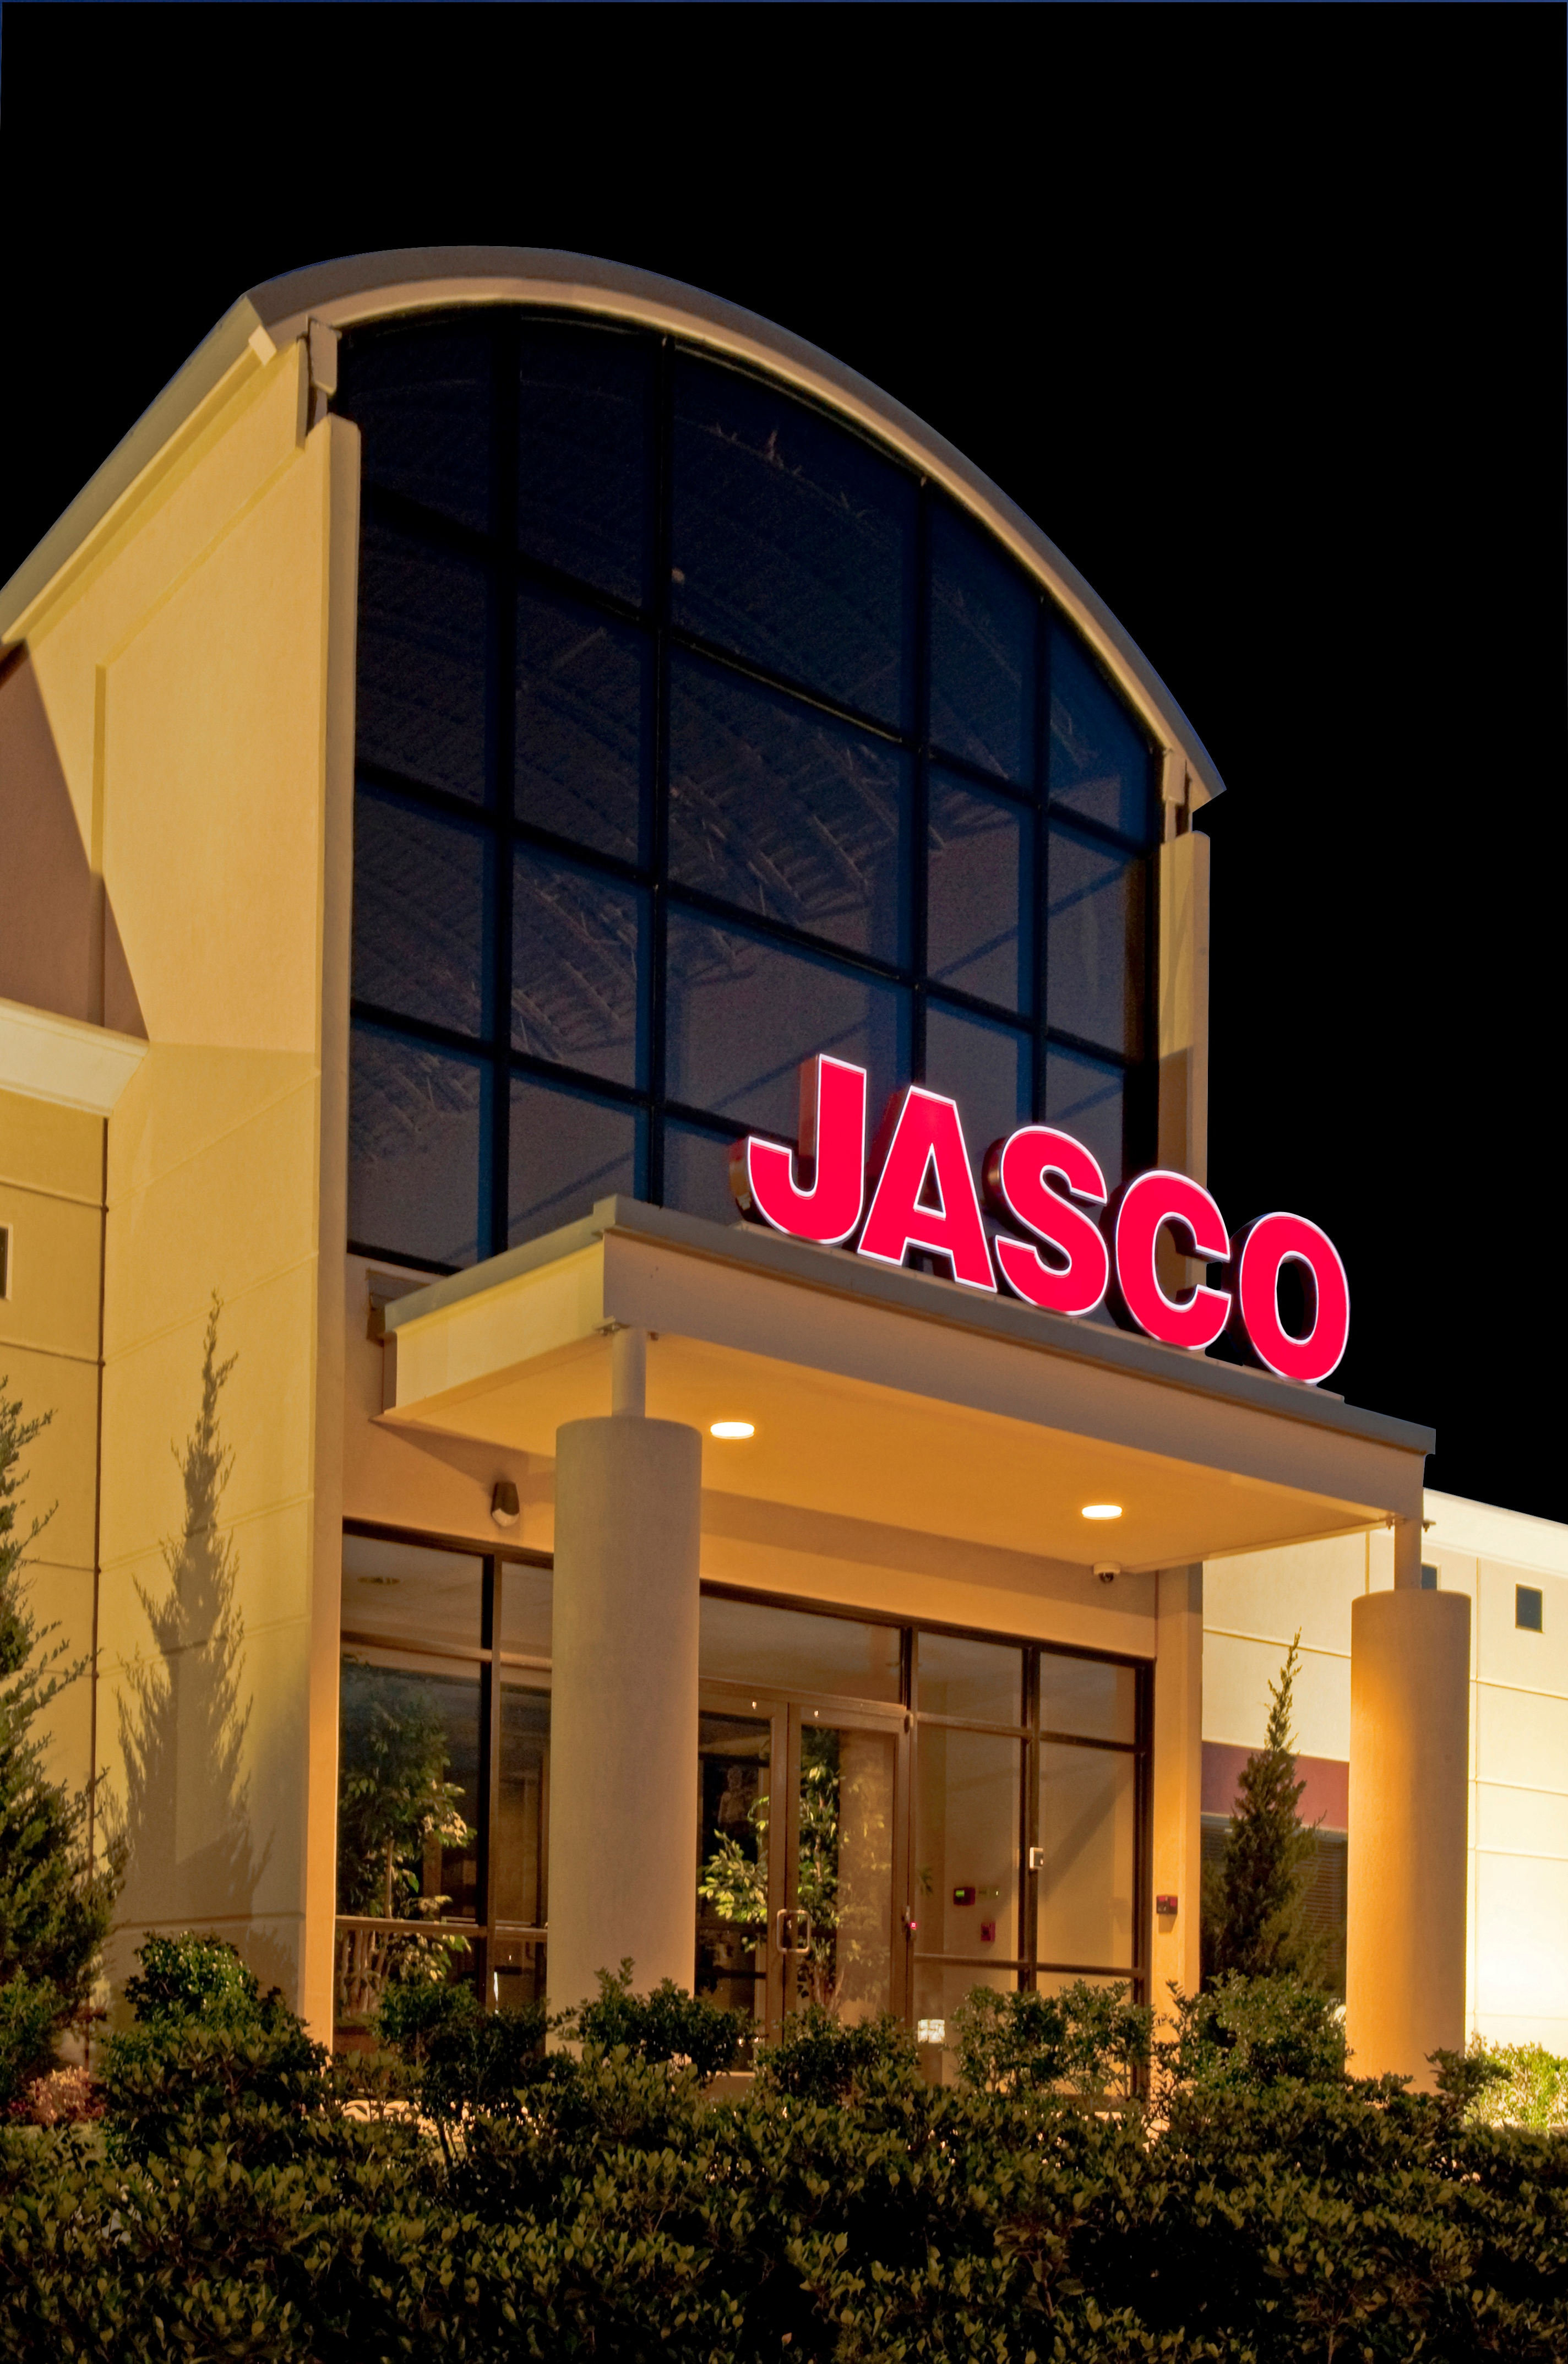 Jasco_night_shot_black_sky